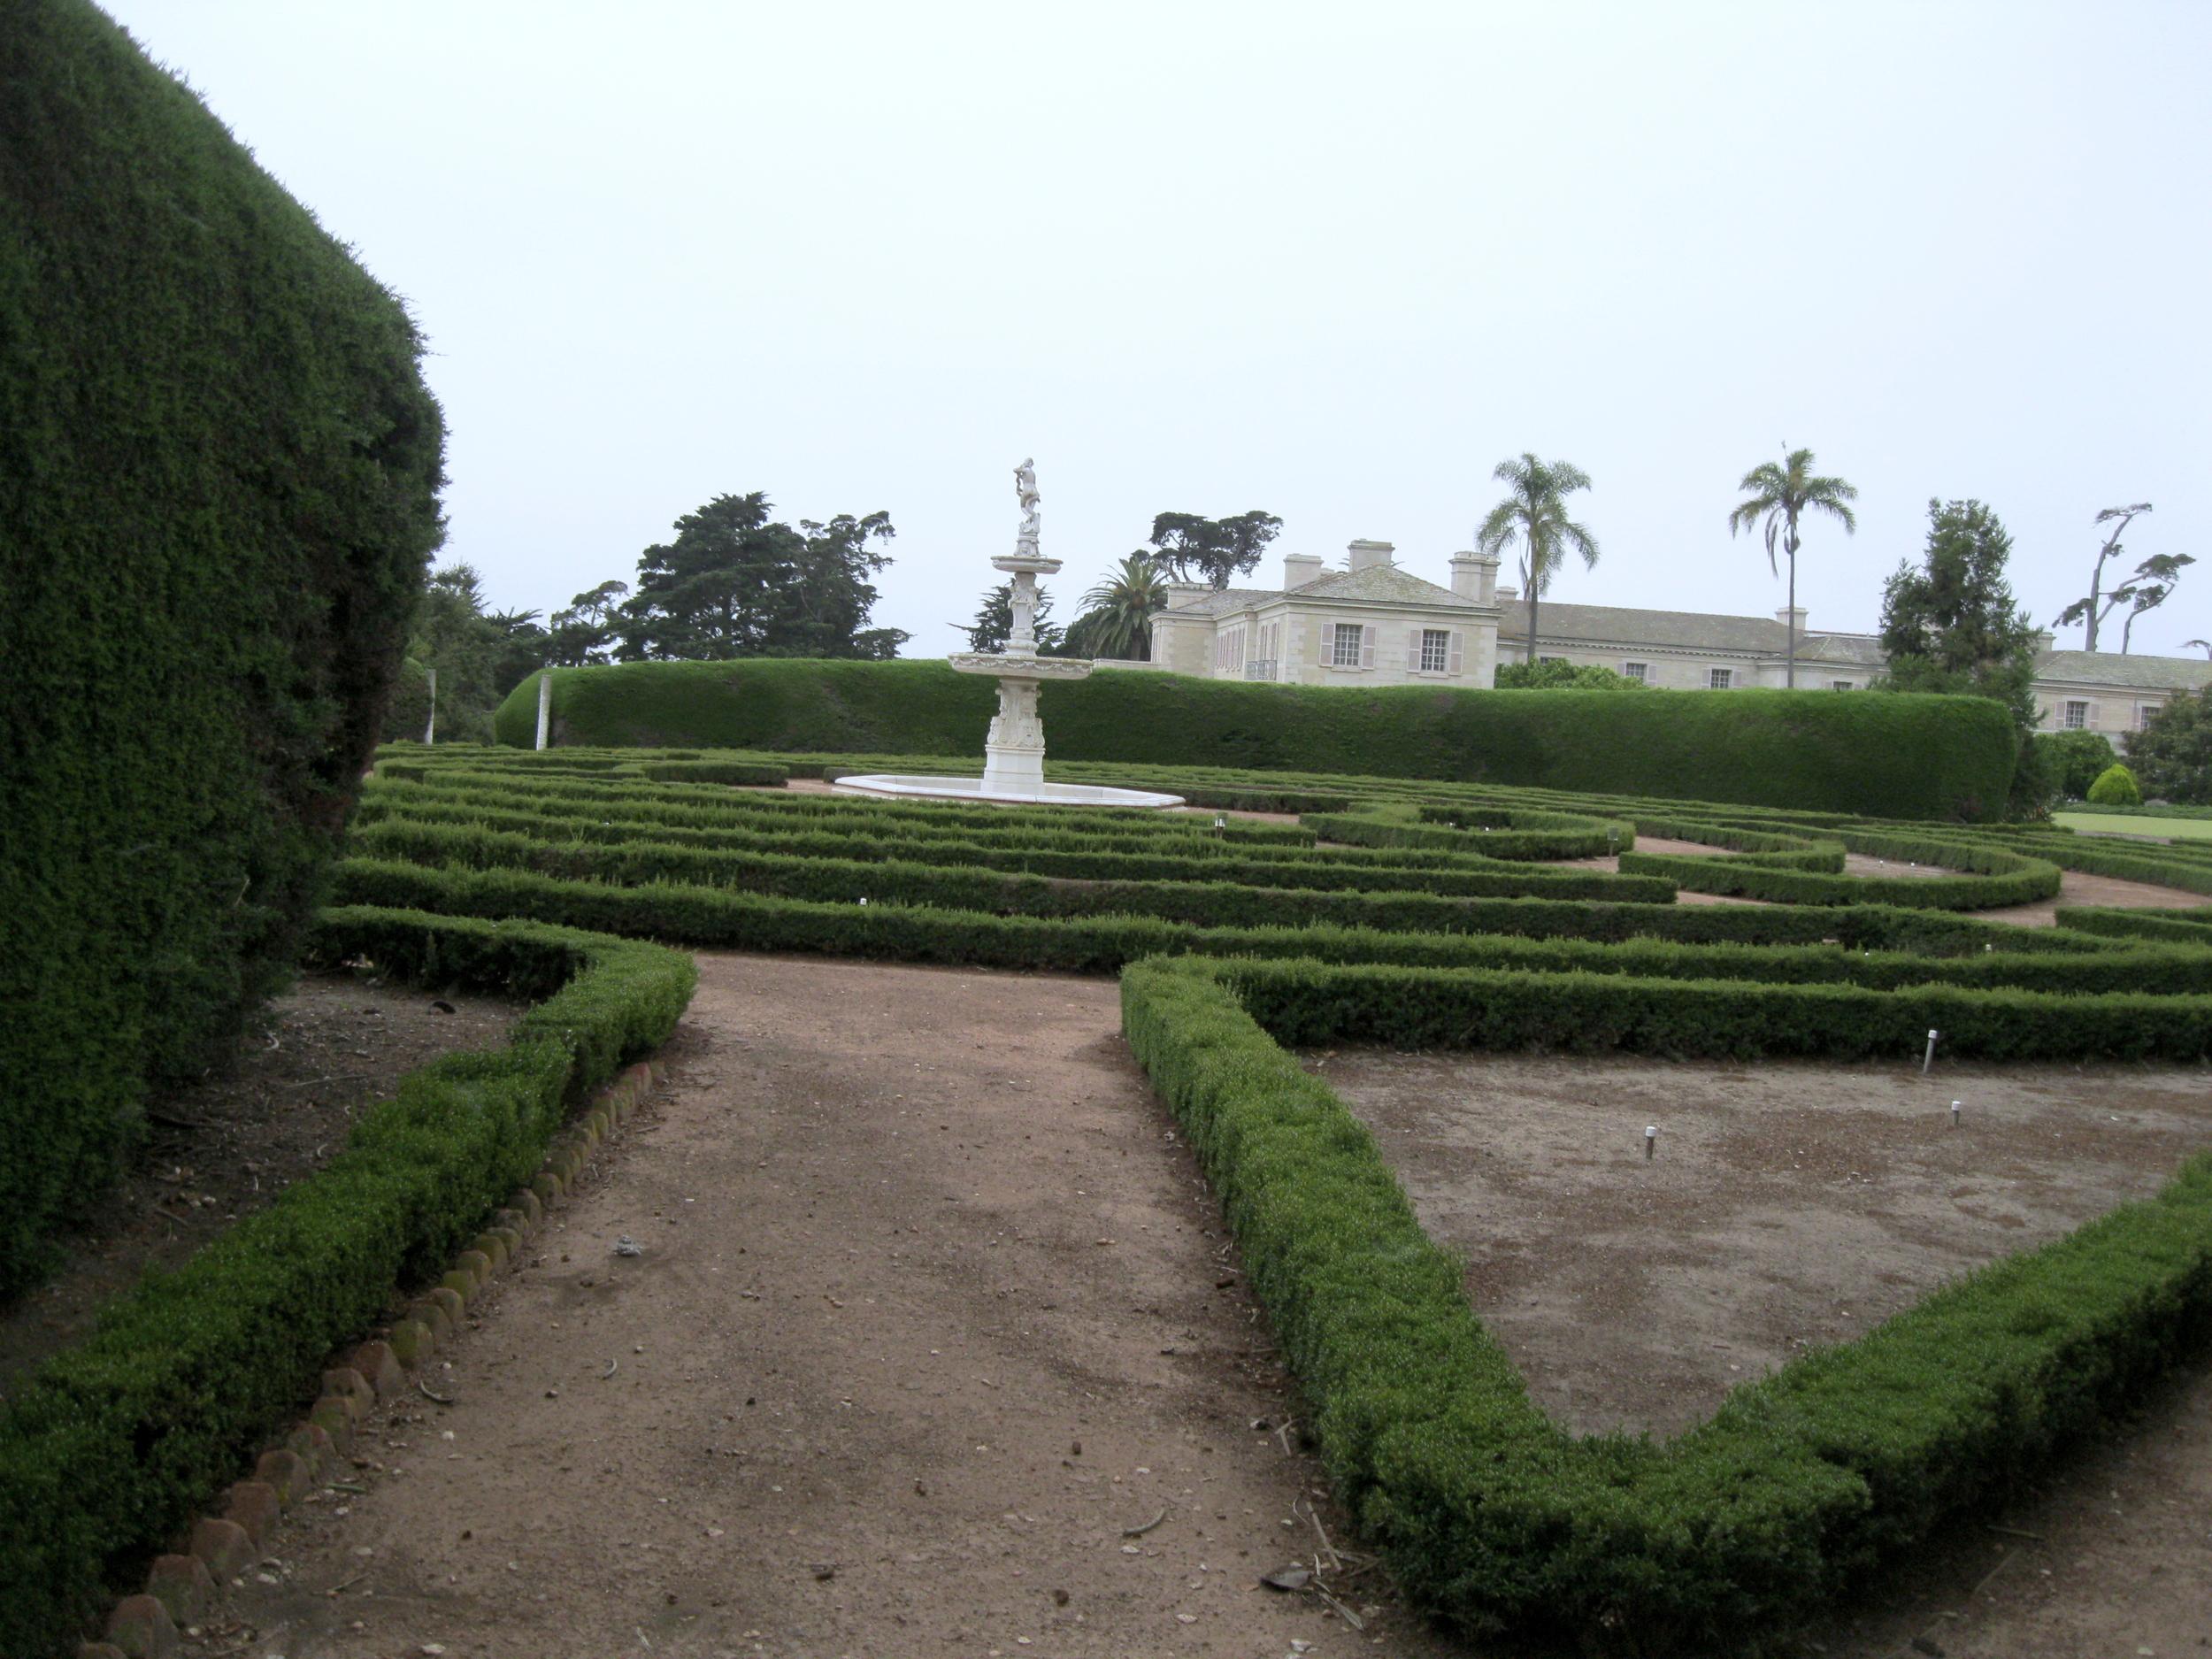 Estate of Huguette Clark from EmptyMansionsBook.com